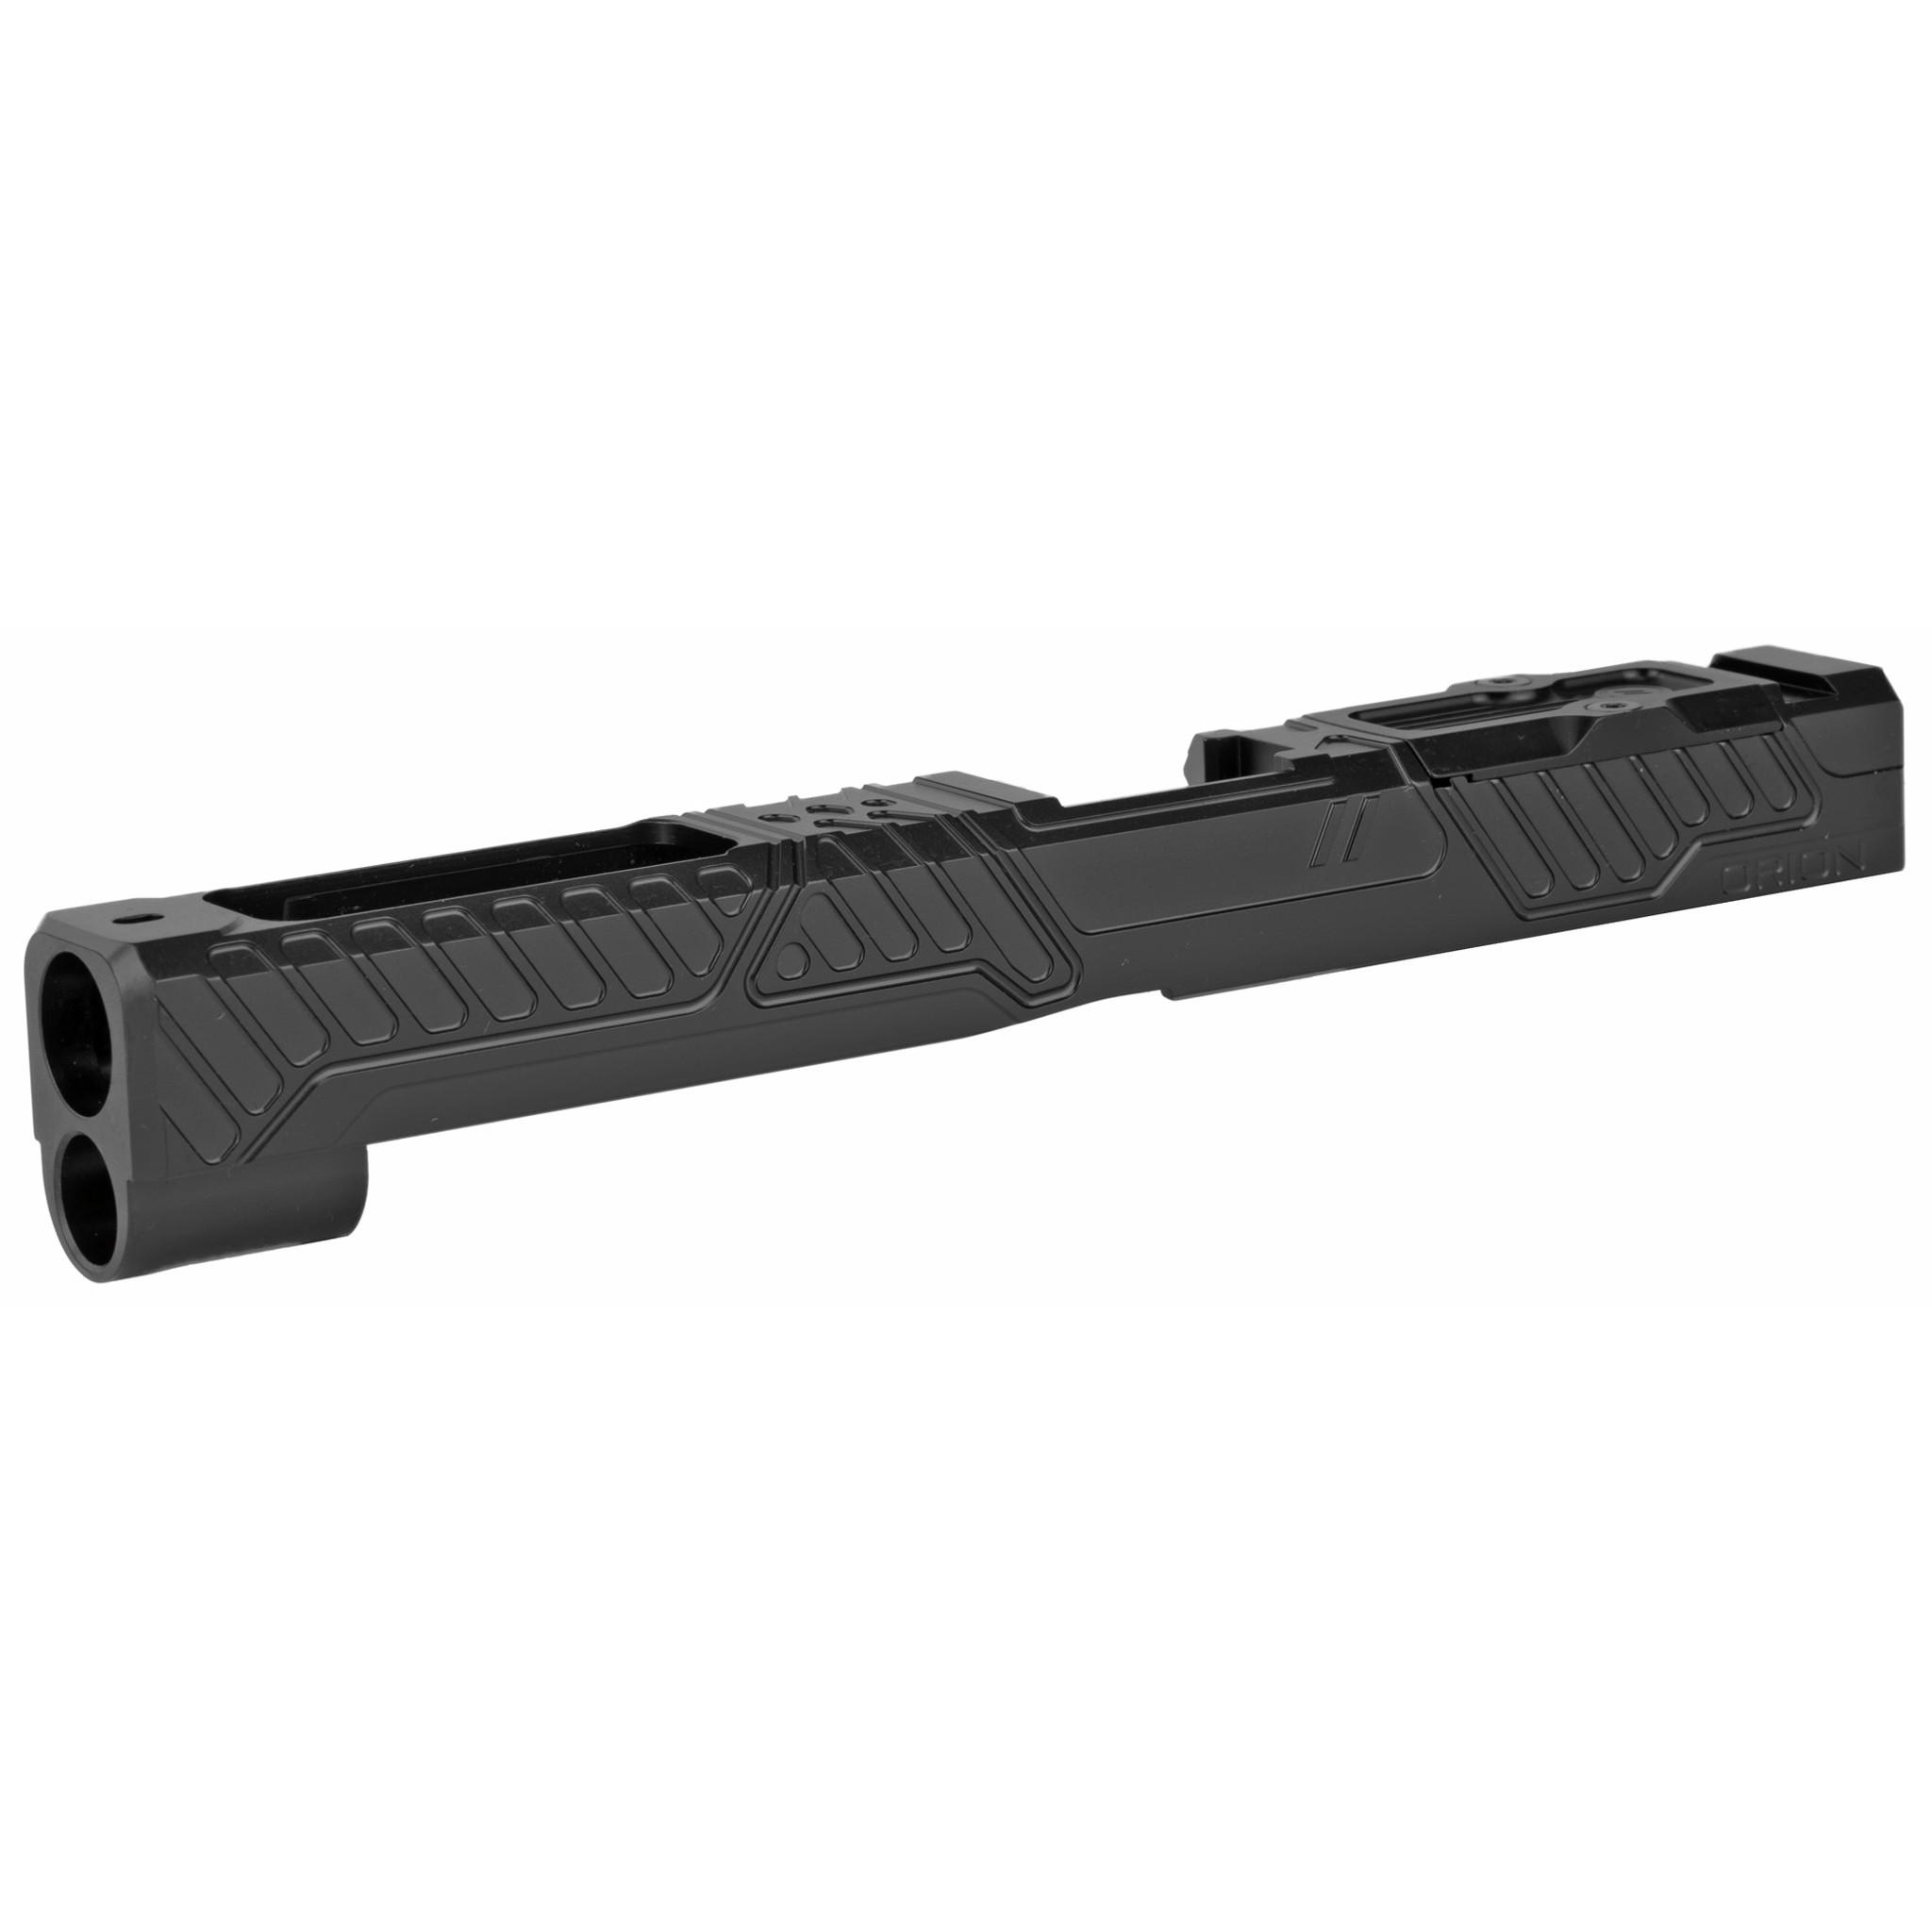 ZEV Z34 Stripped Orion Slide For Glock 34 GEN 4 - Black